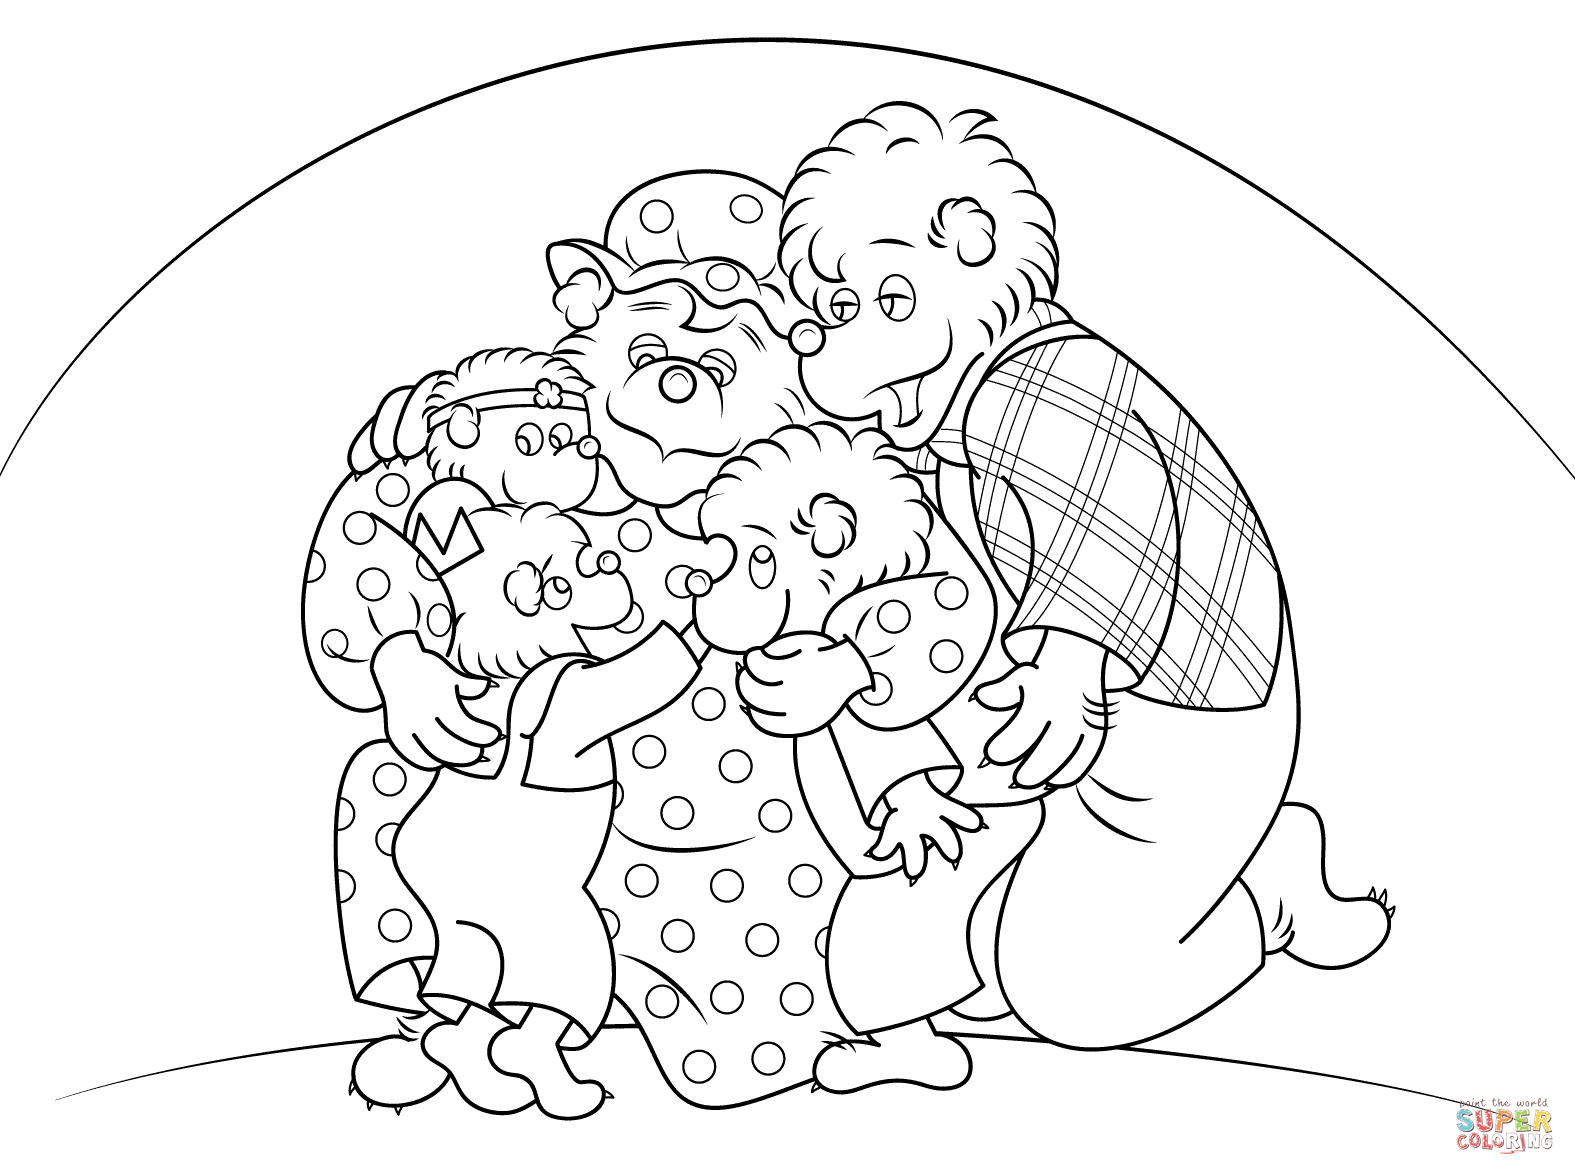 Gummy Bears Drawing At Getdrawings